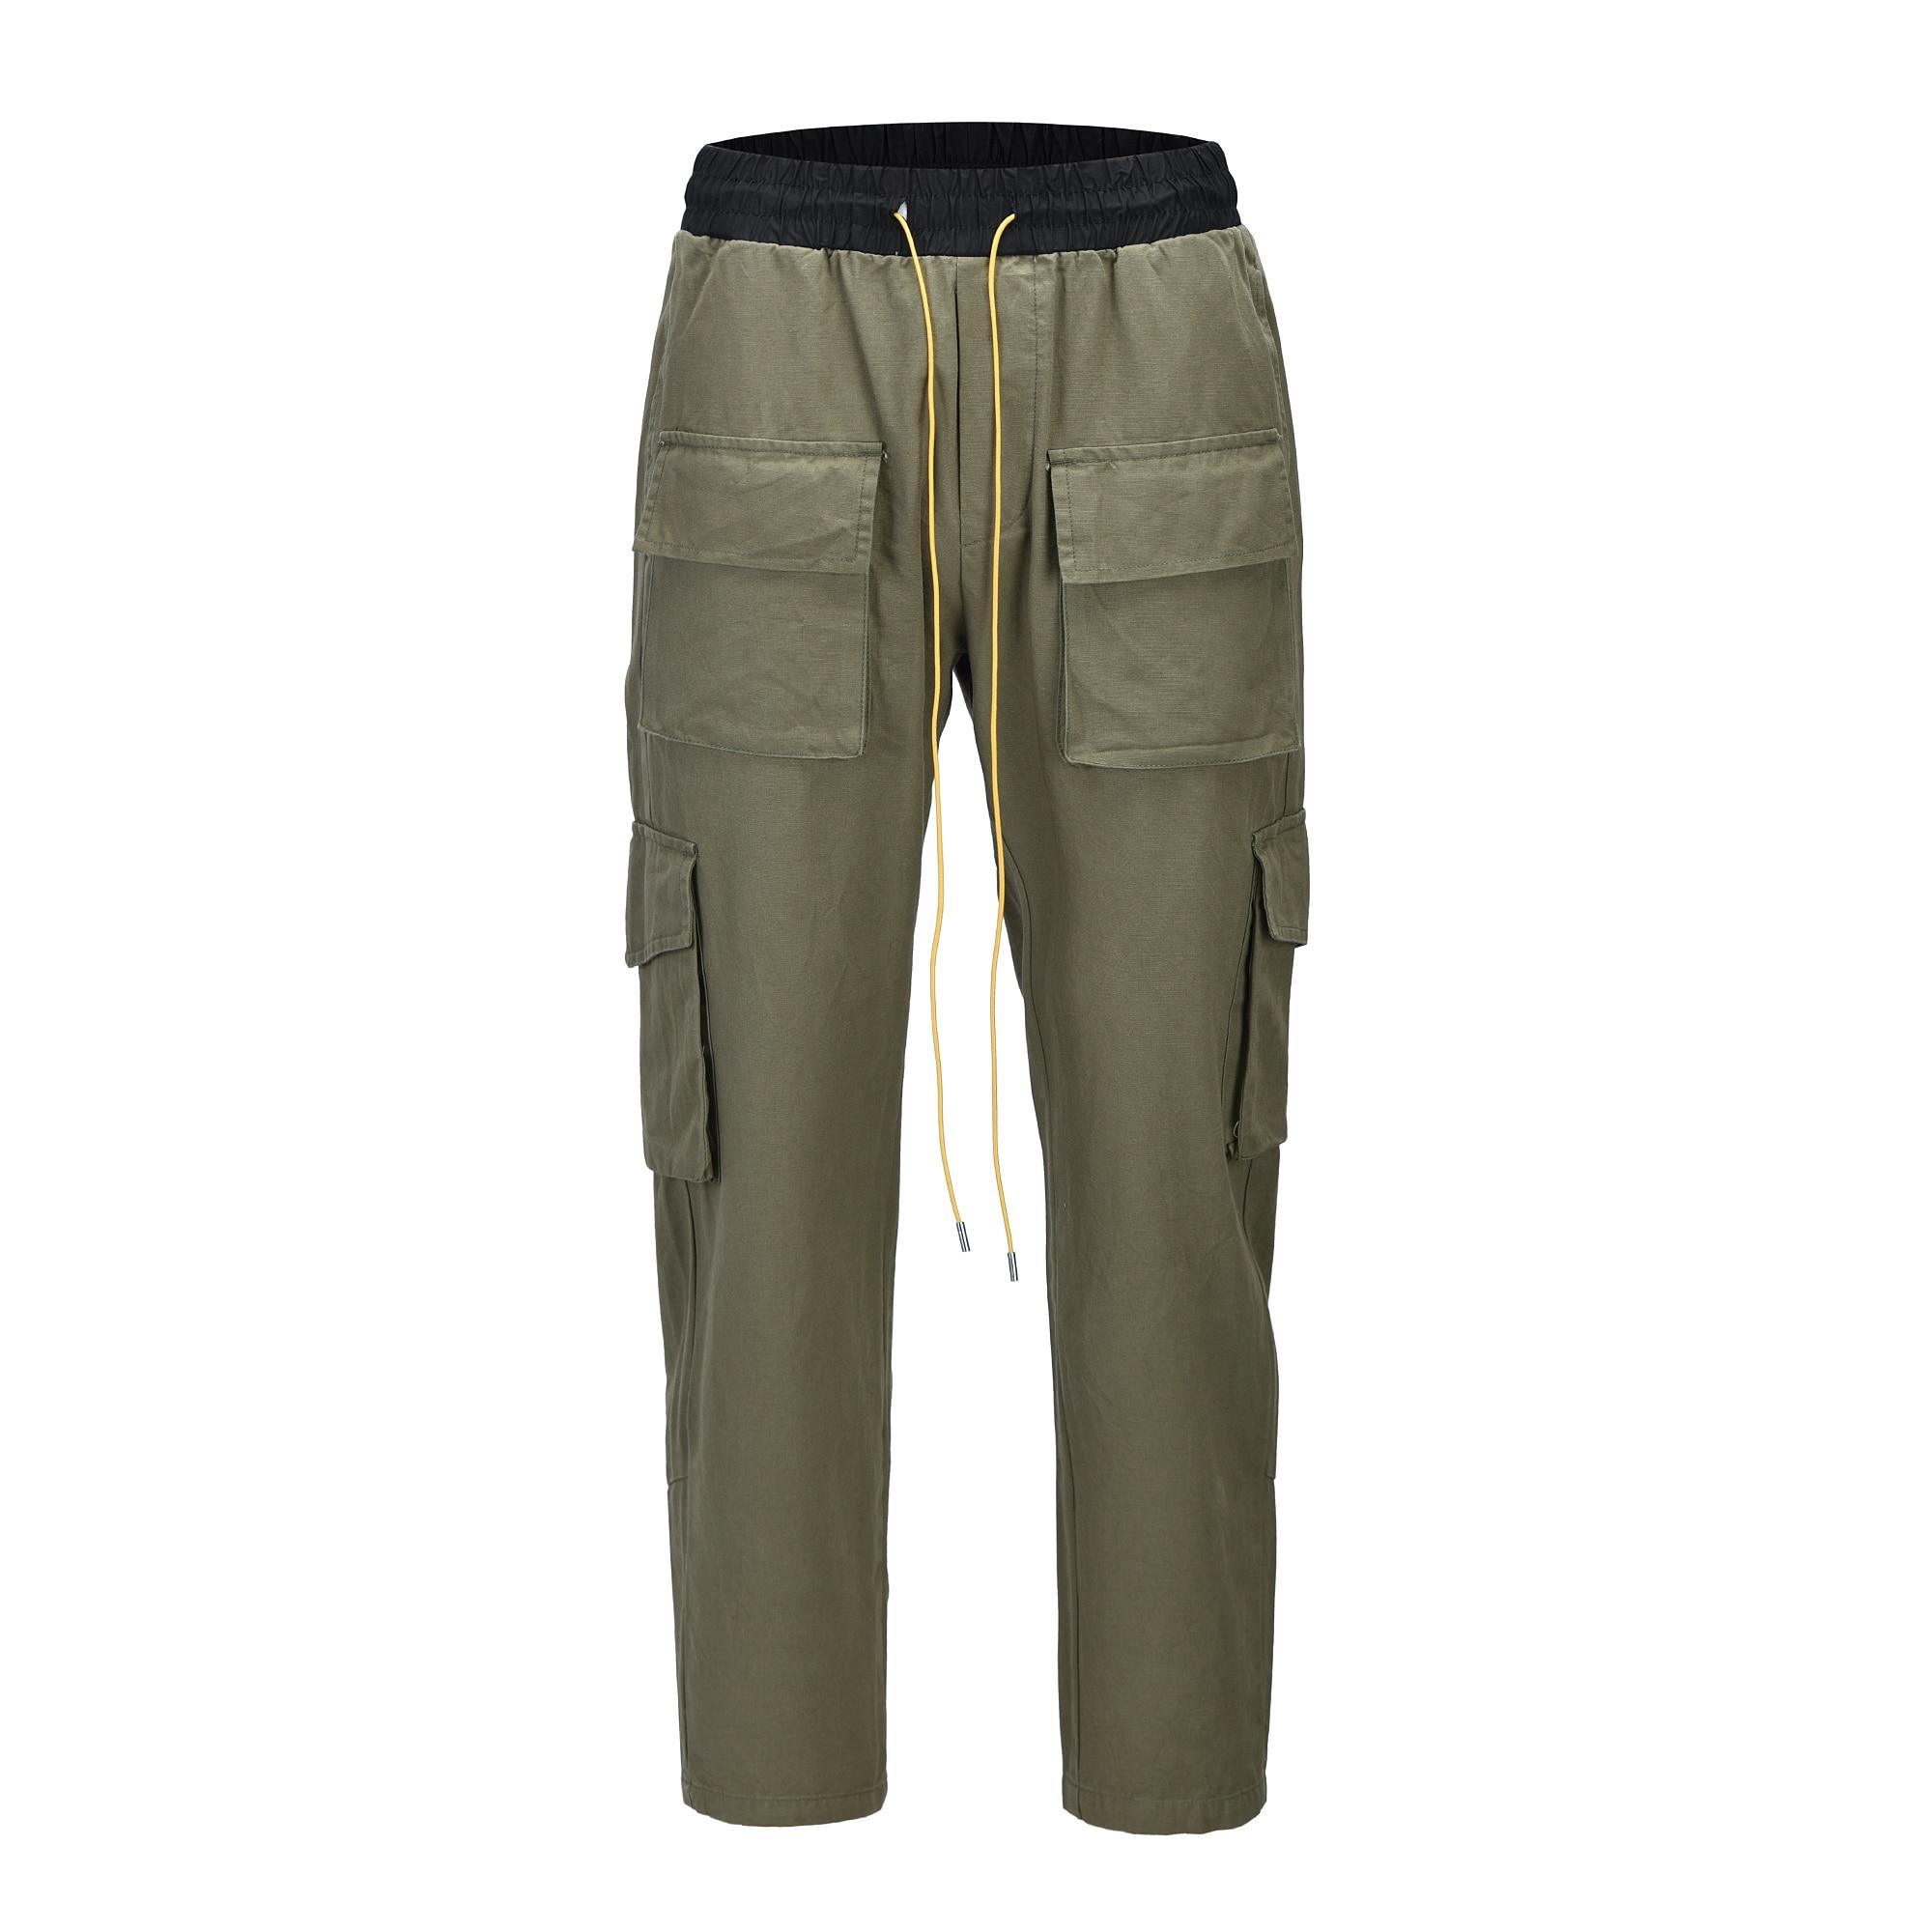 2019 New Arrival Joggers Pants Ankle-botton High Street Casual Mens Jogger Pants Loose Fit Pants Fashion Trousers Sweatpants